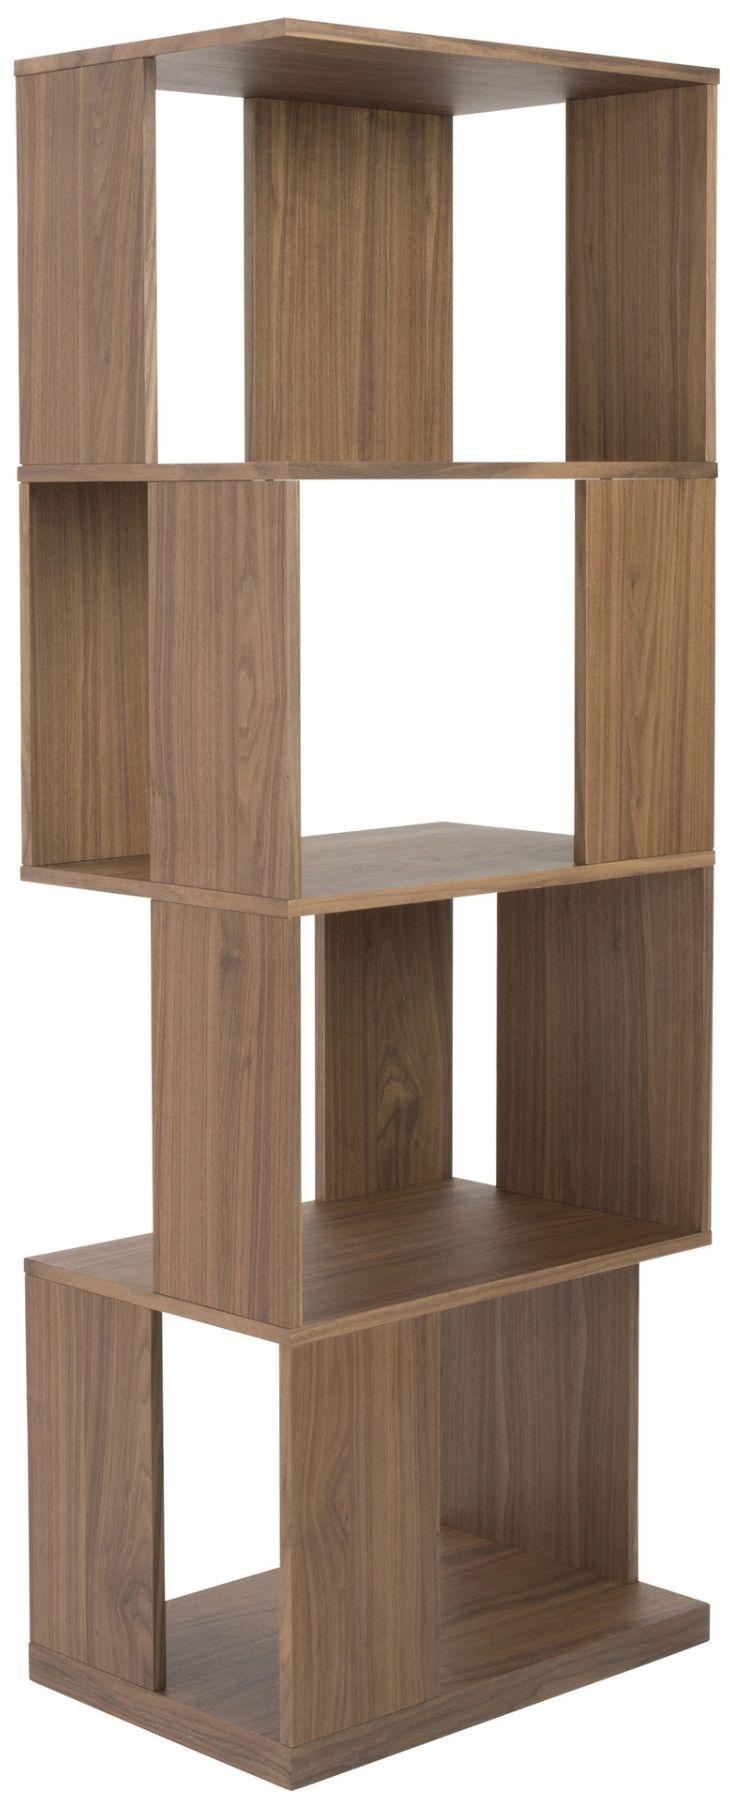 Chateau bookcase walnut leaning bookcase white modern bookcase walnut - Chalais Shelving Unit Walnut